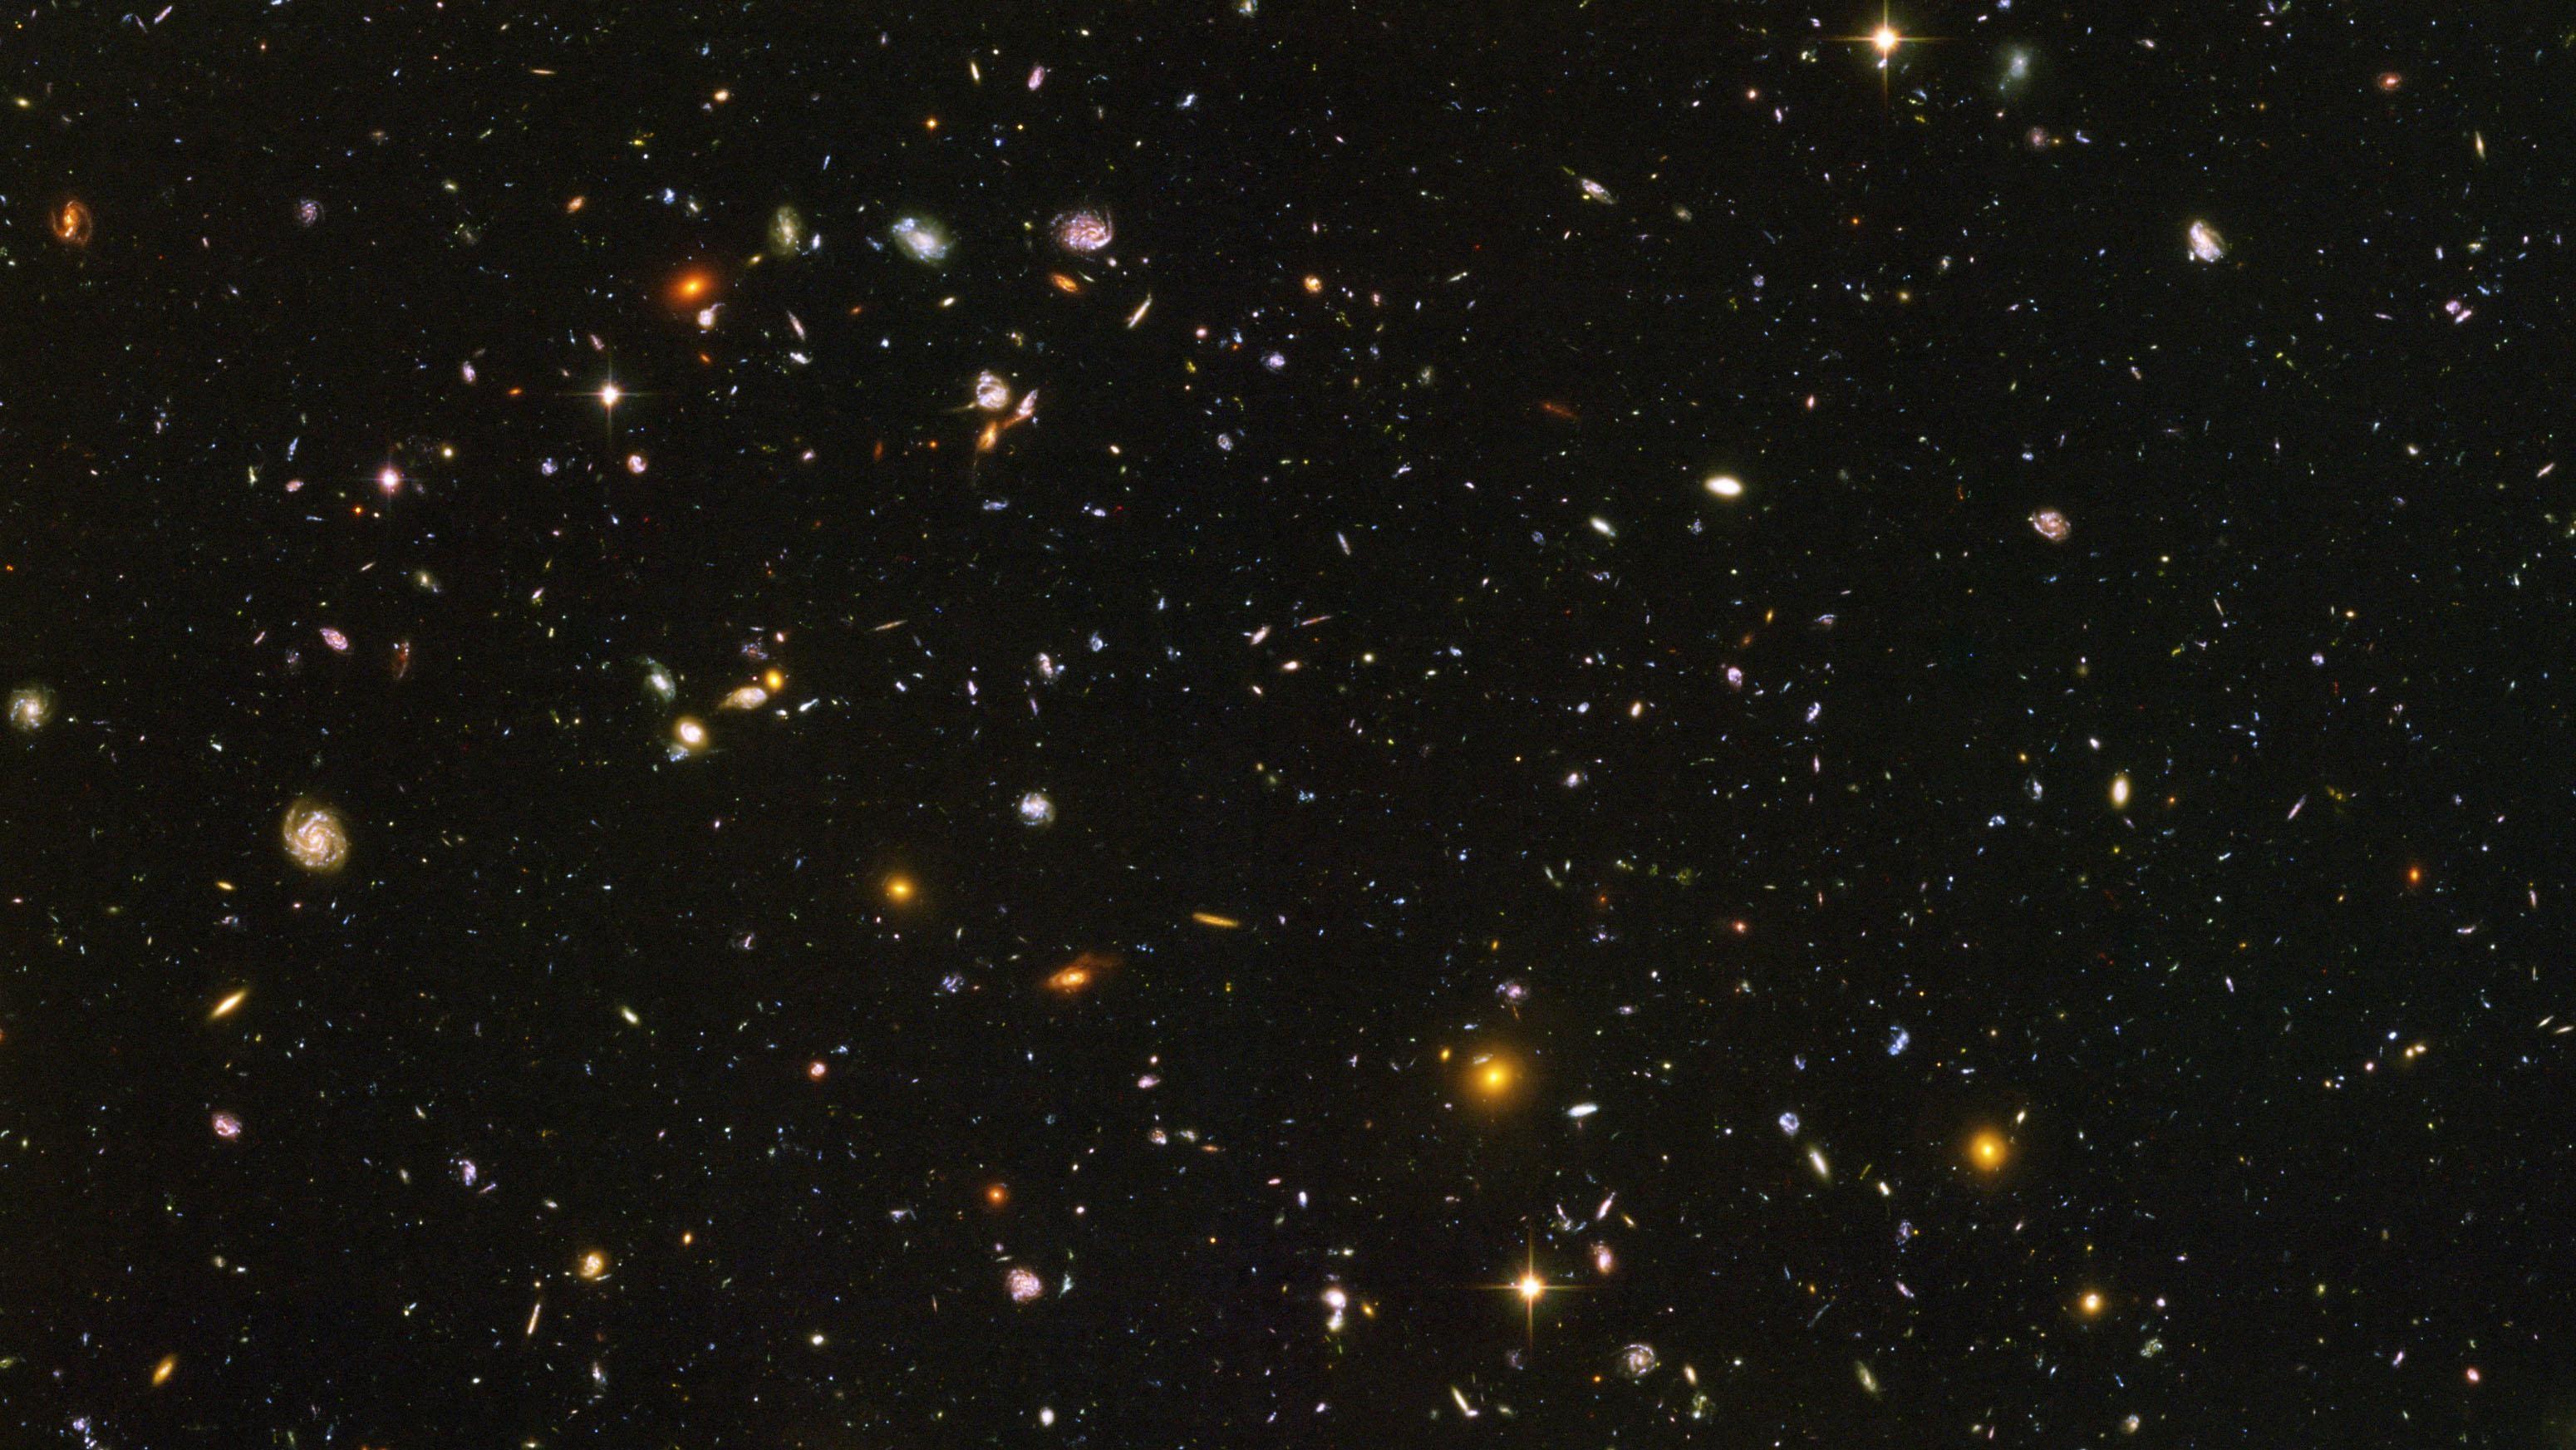 Hubble Ultra Deep Field Hd Backgrounds 18 High   Wallpaperiz.com